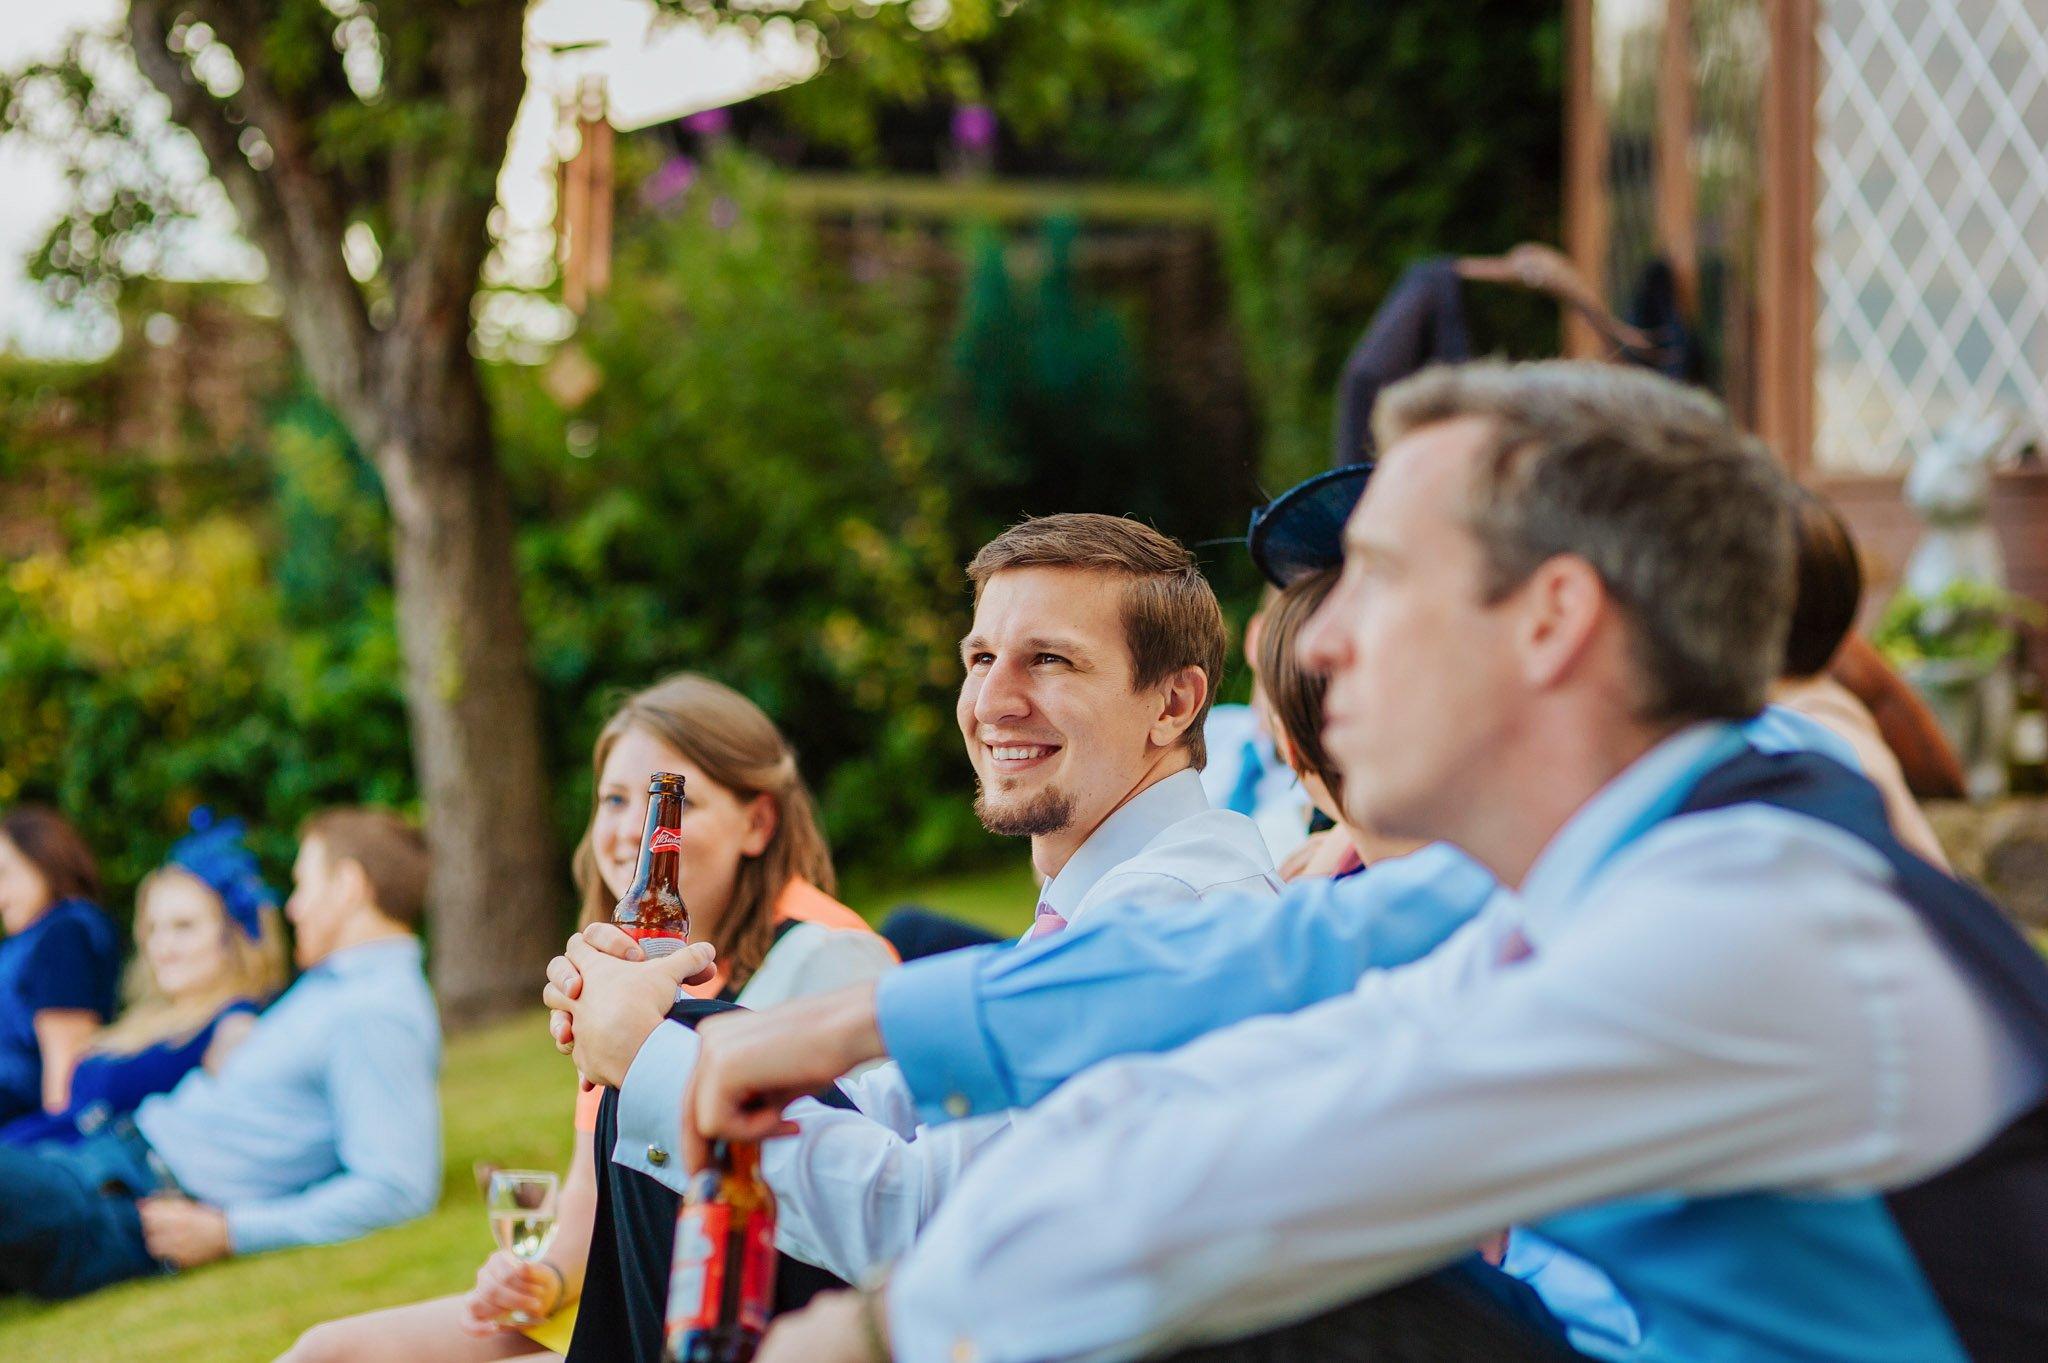 Georgina + Mike - Wedding photography in Malvern, Worcestershire 60